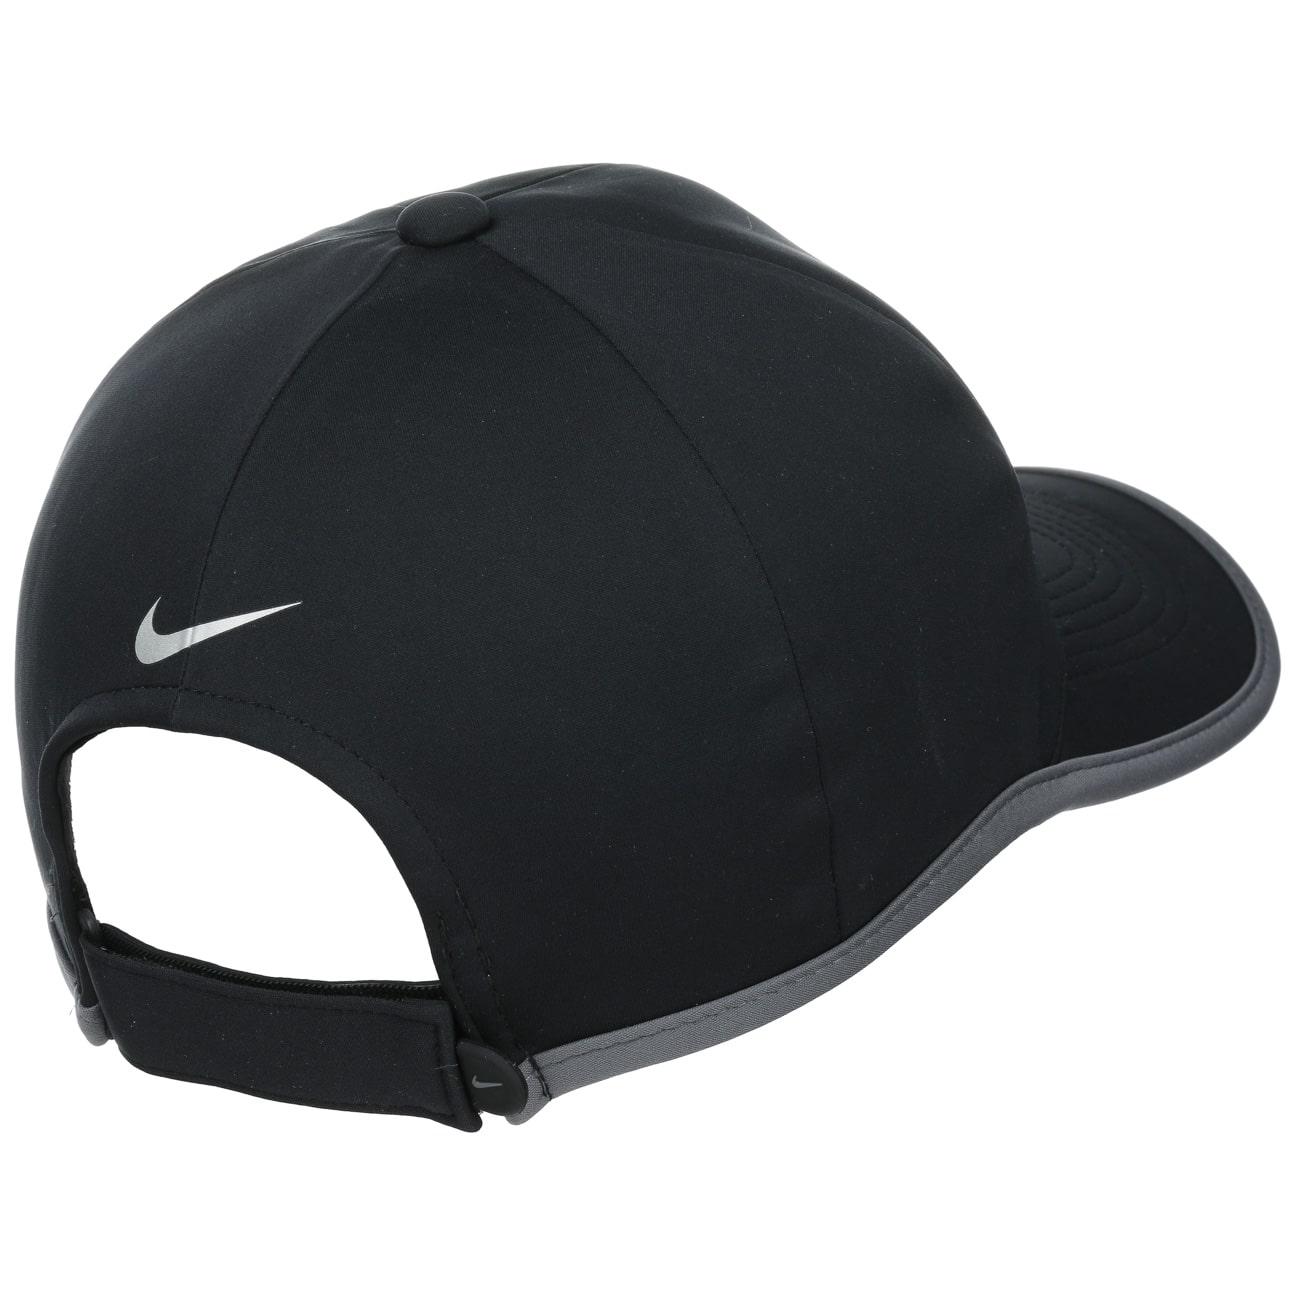 49f26baf3fae1 Ultralight Storm-FIT Cap by Nike - black 2 ...